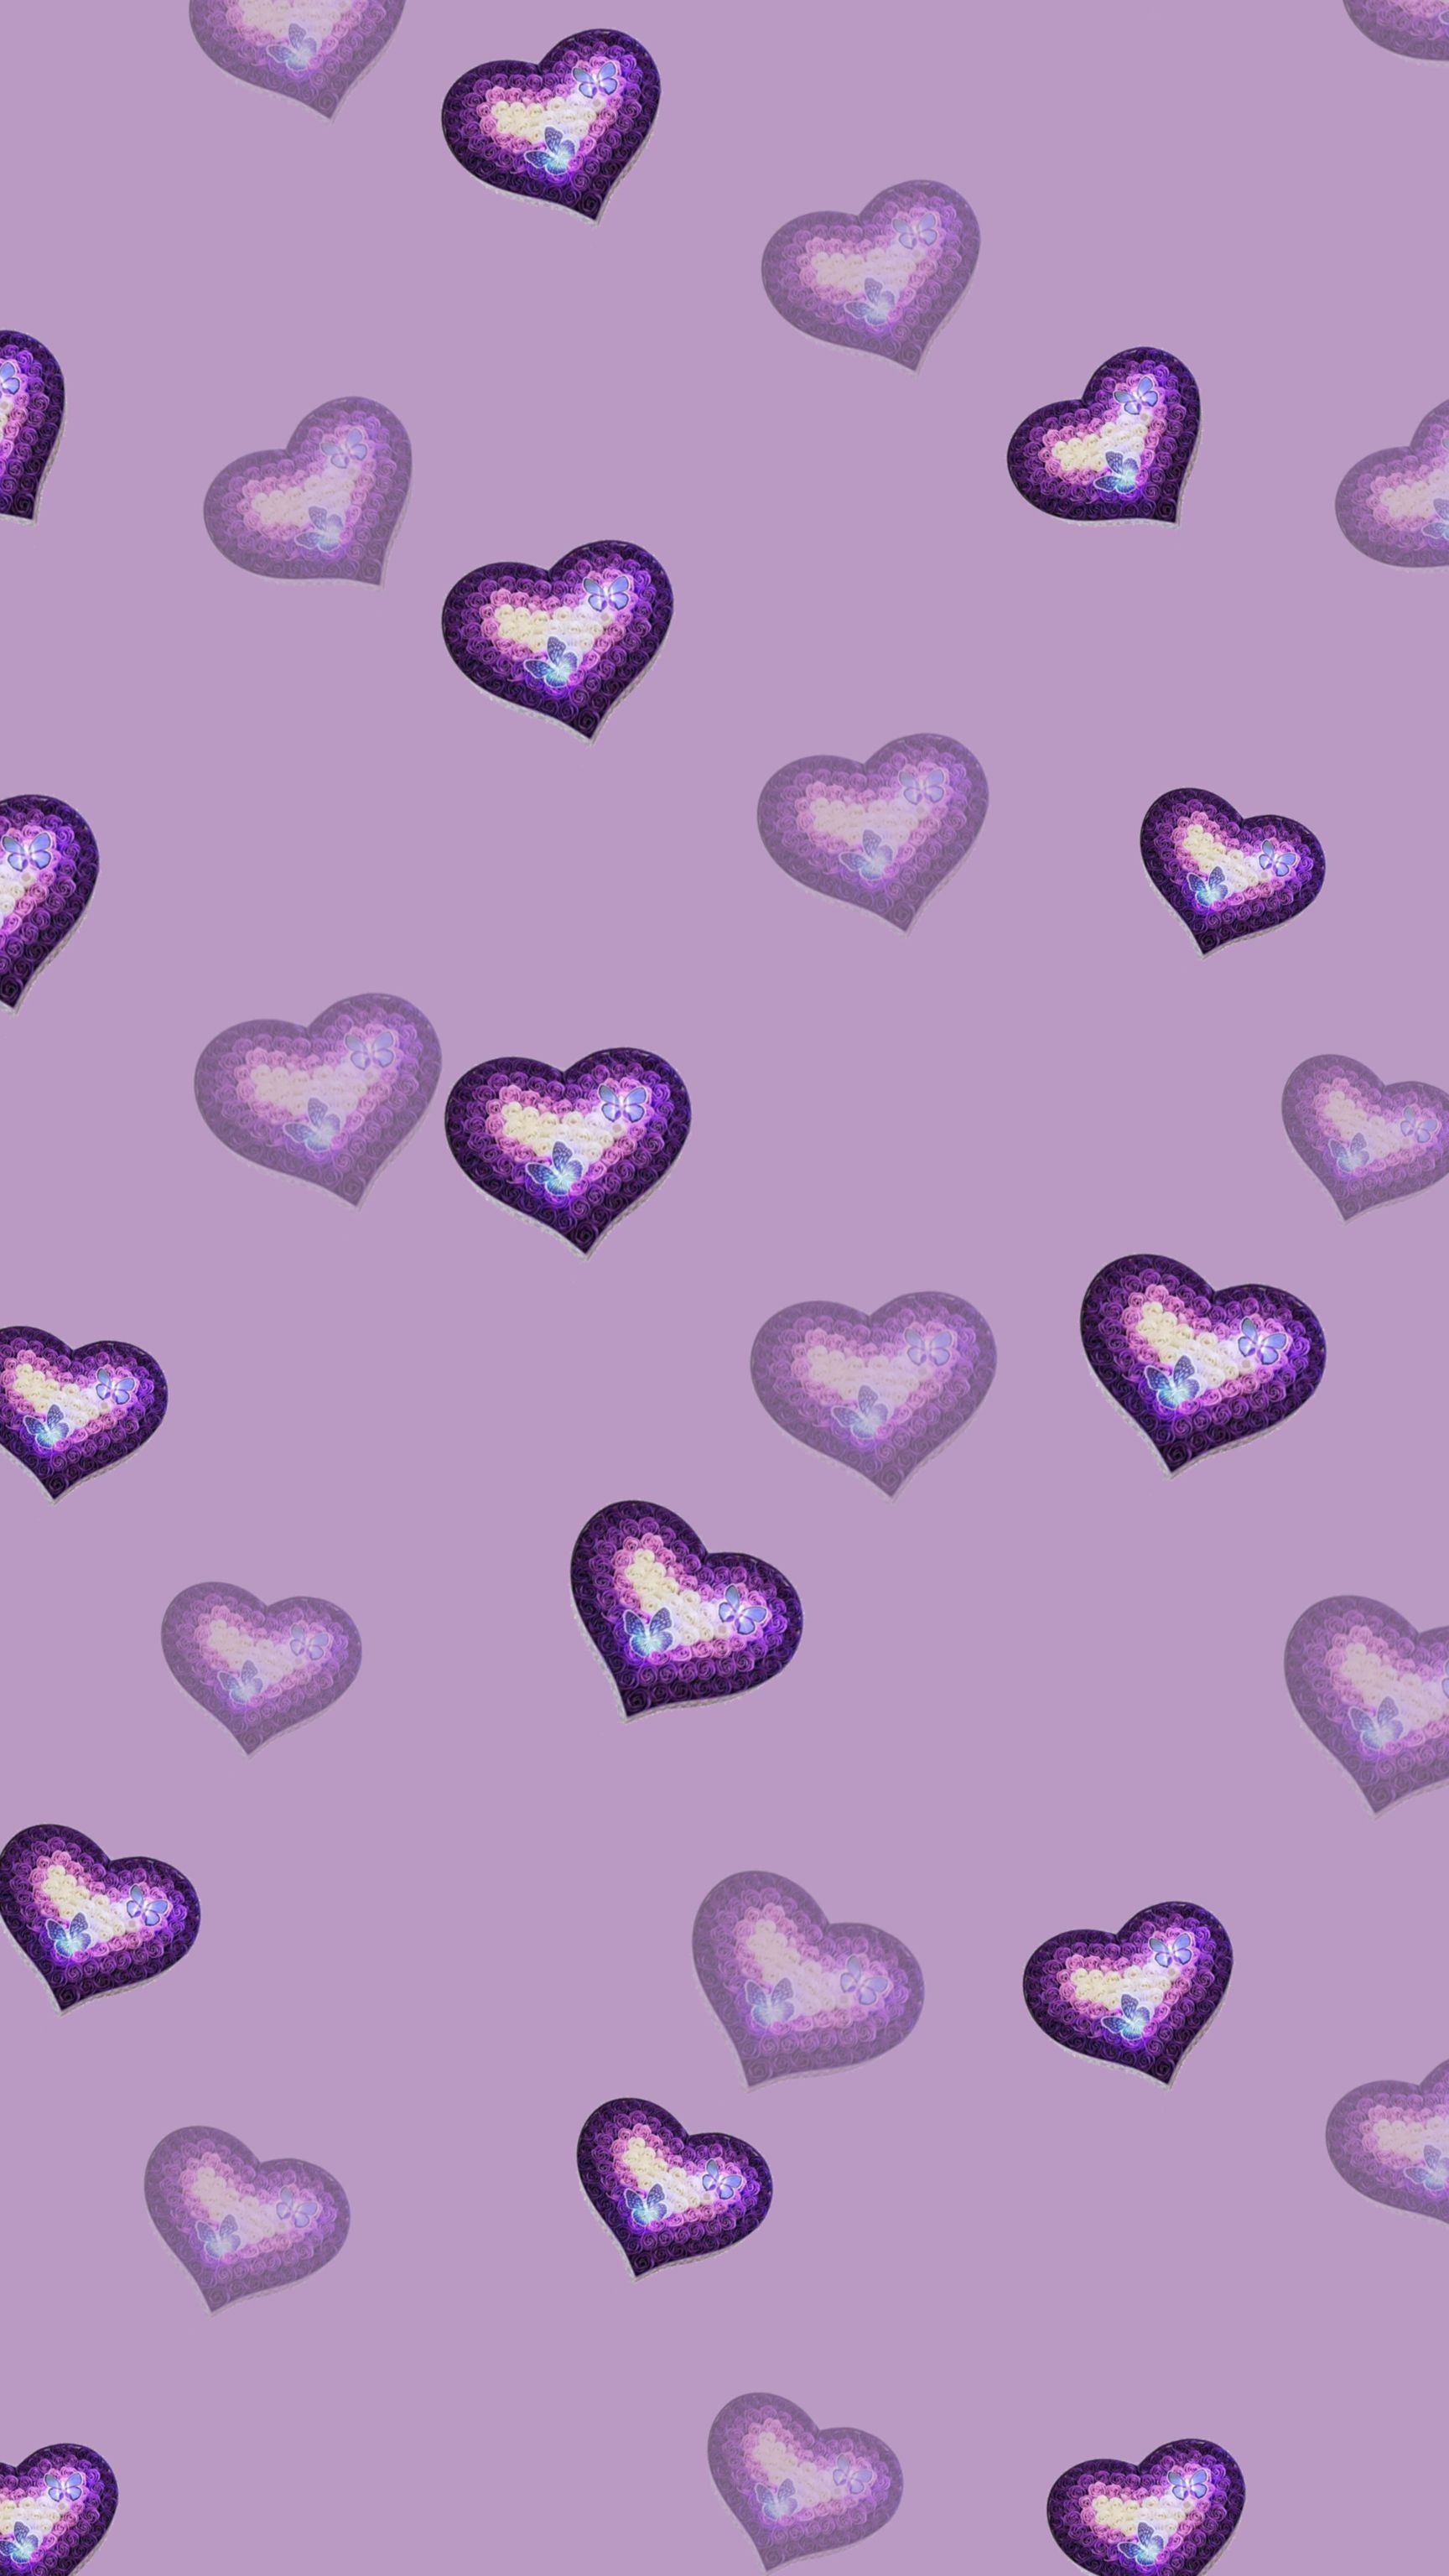 Lilac Purple Heart Wallpaper Purple Wallpaper Cellphone Wallpaper